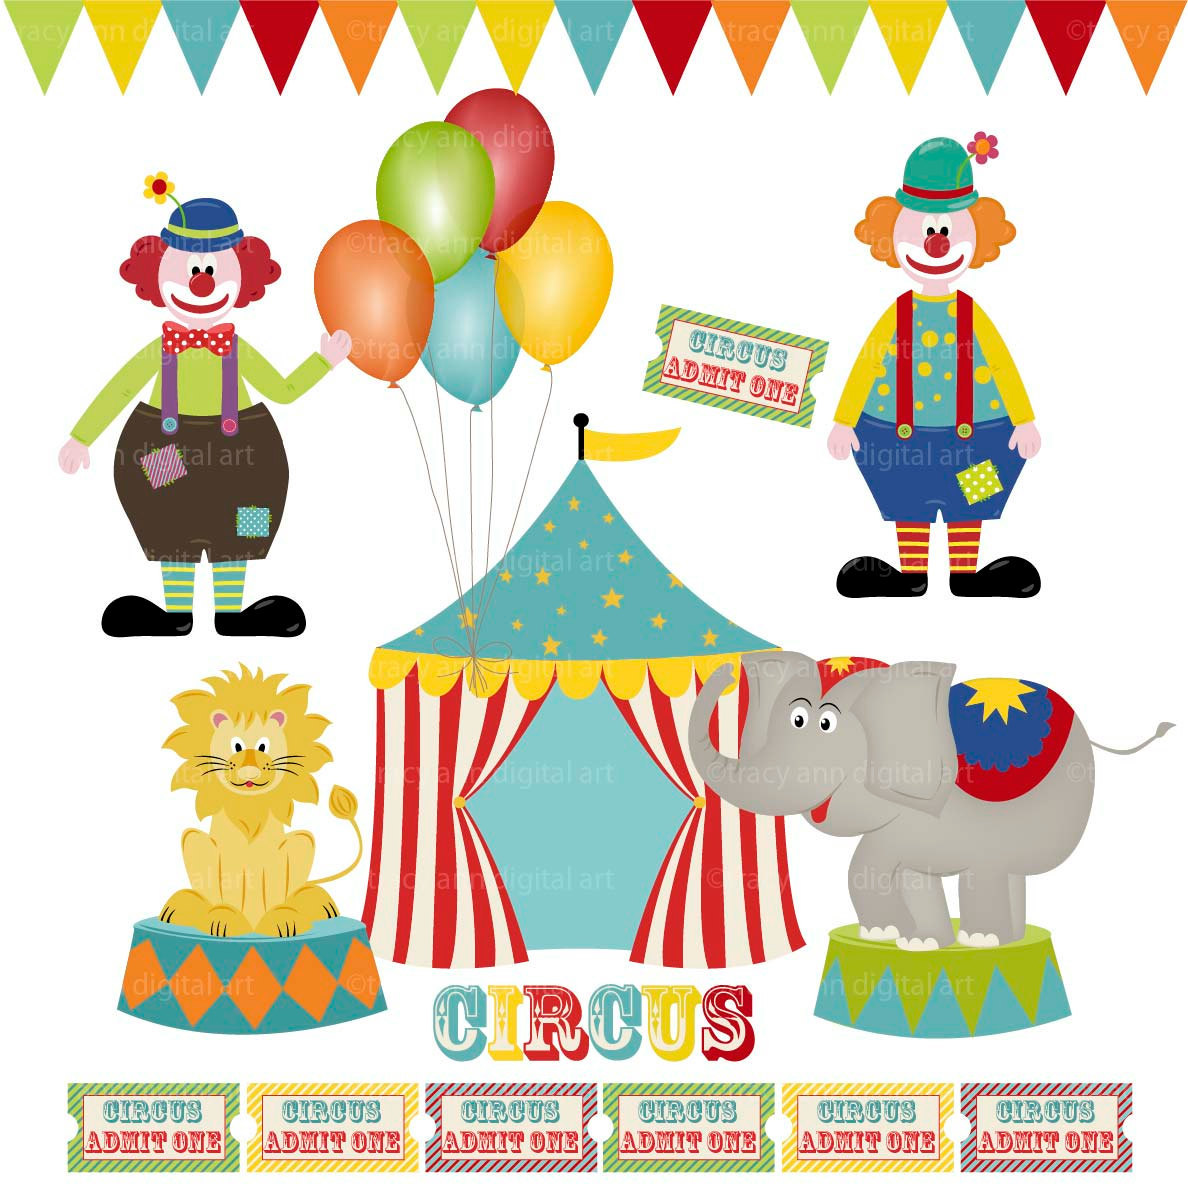 Seal clipart circus show #3